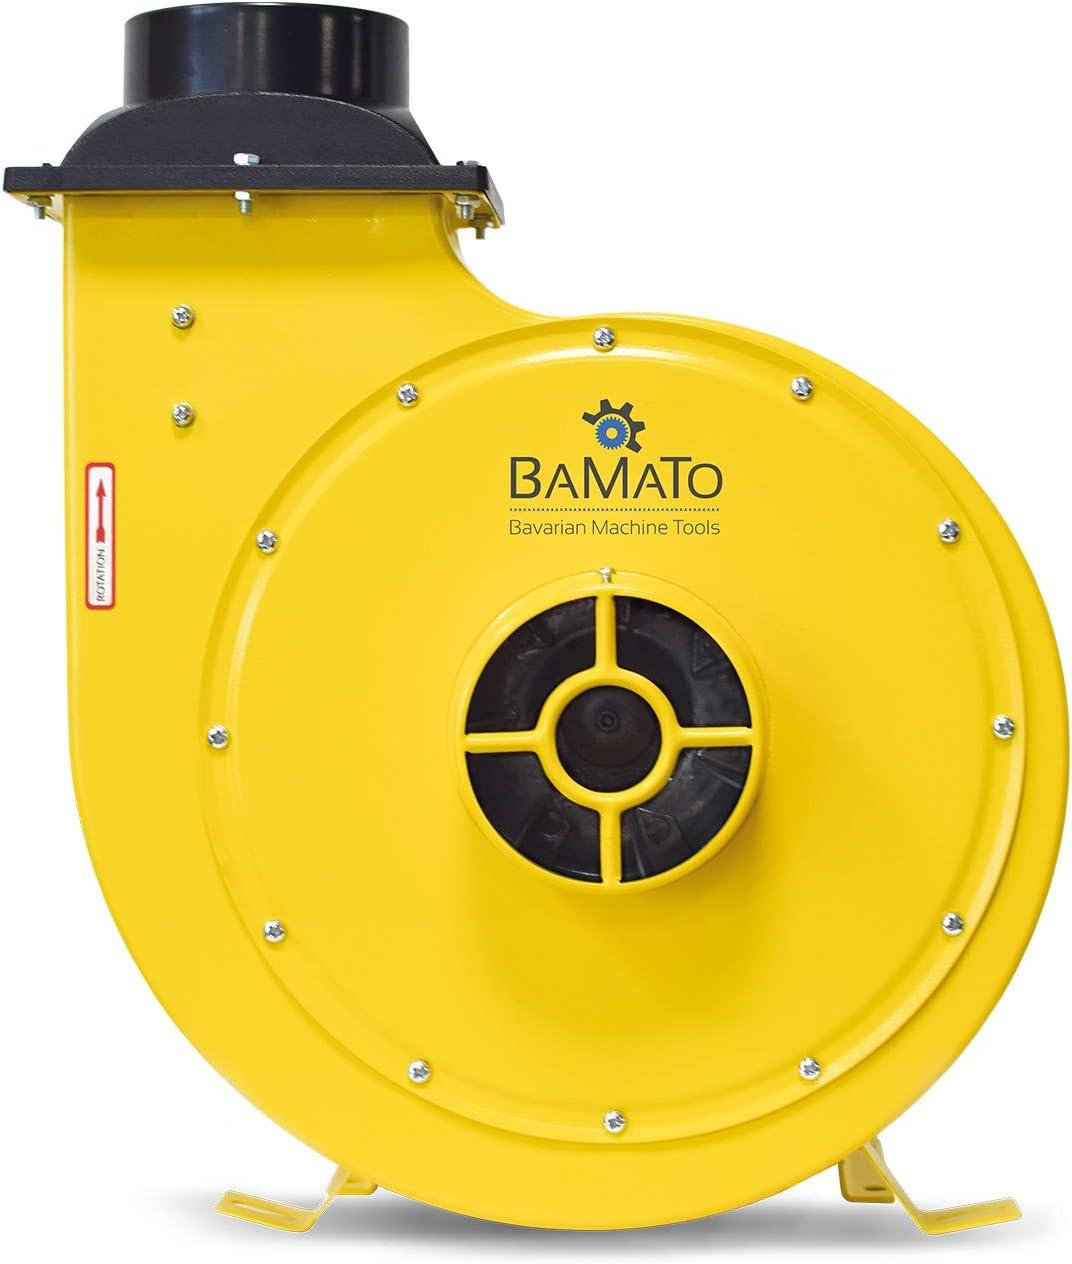 400 V Y-Adapter Absauganlage BAMATO Radialventilator AB-300 inkl